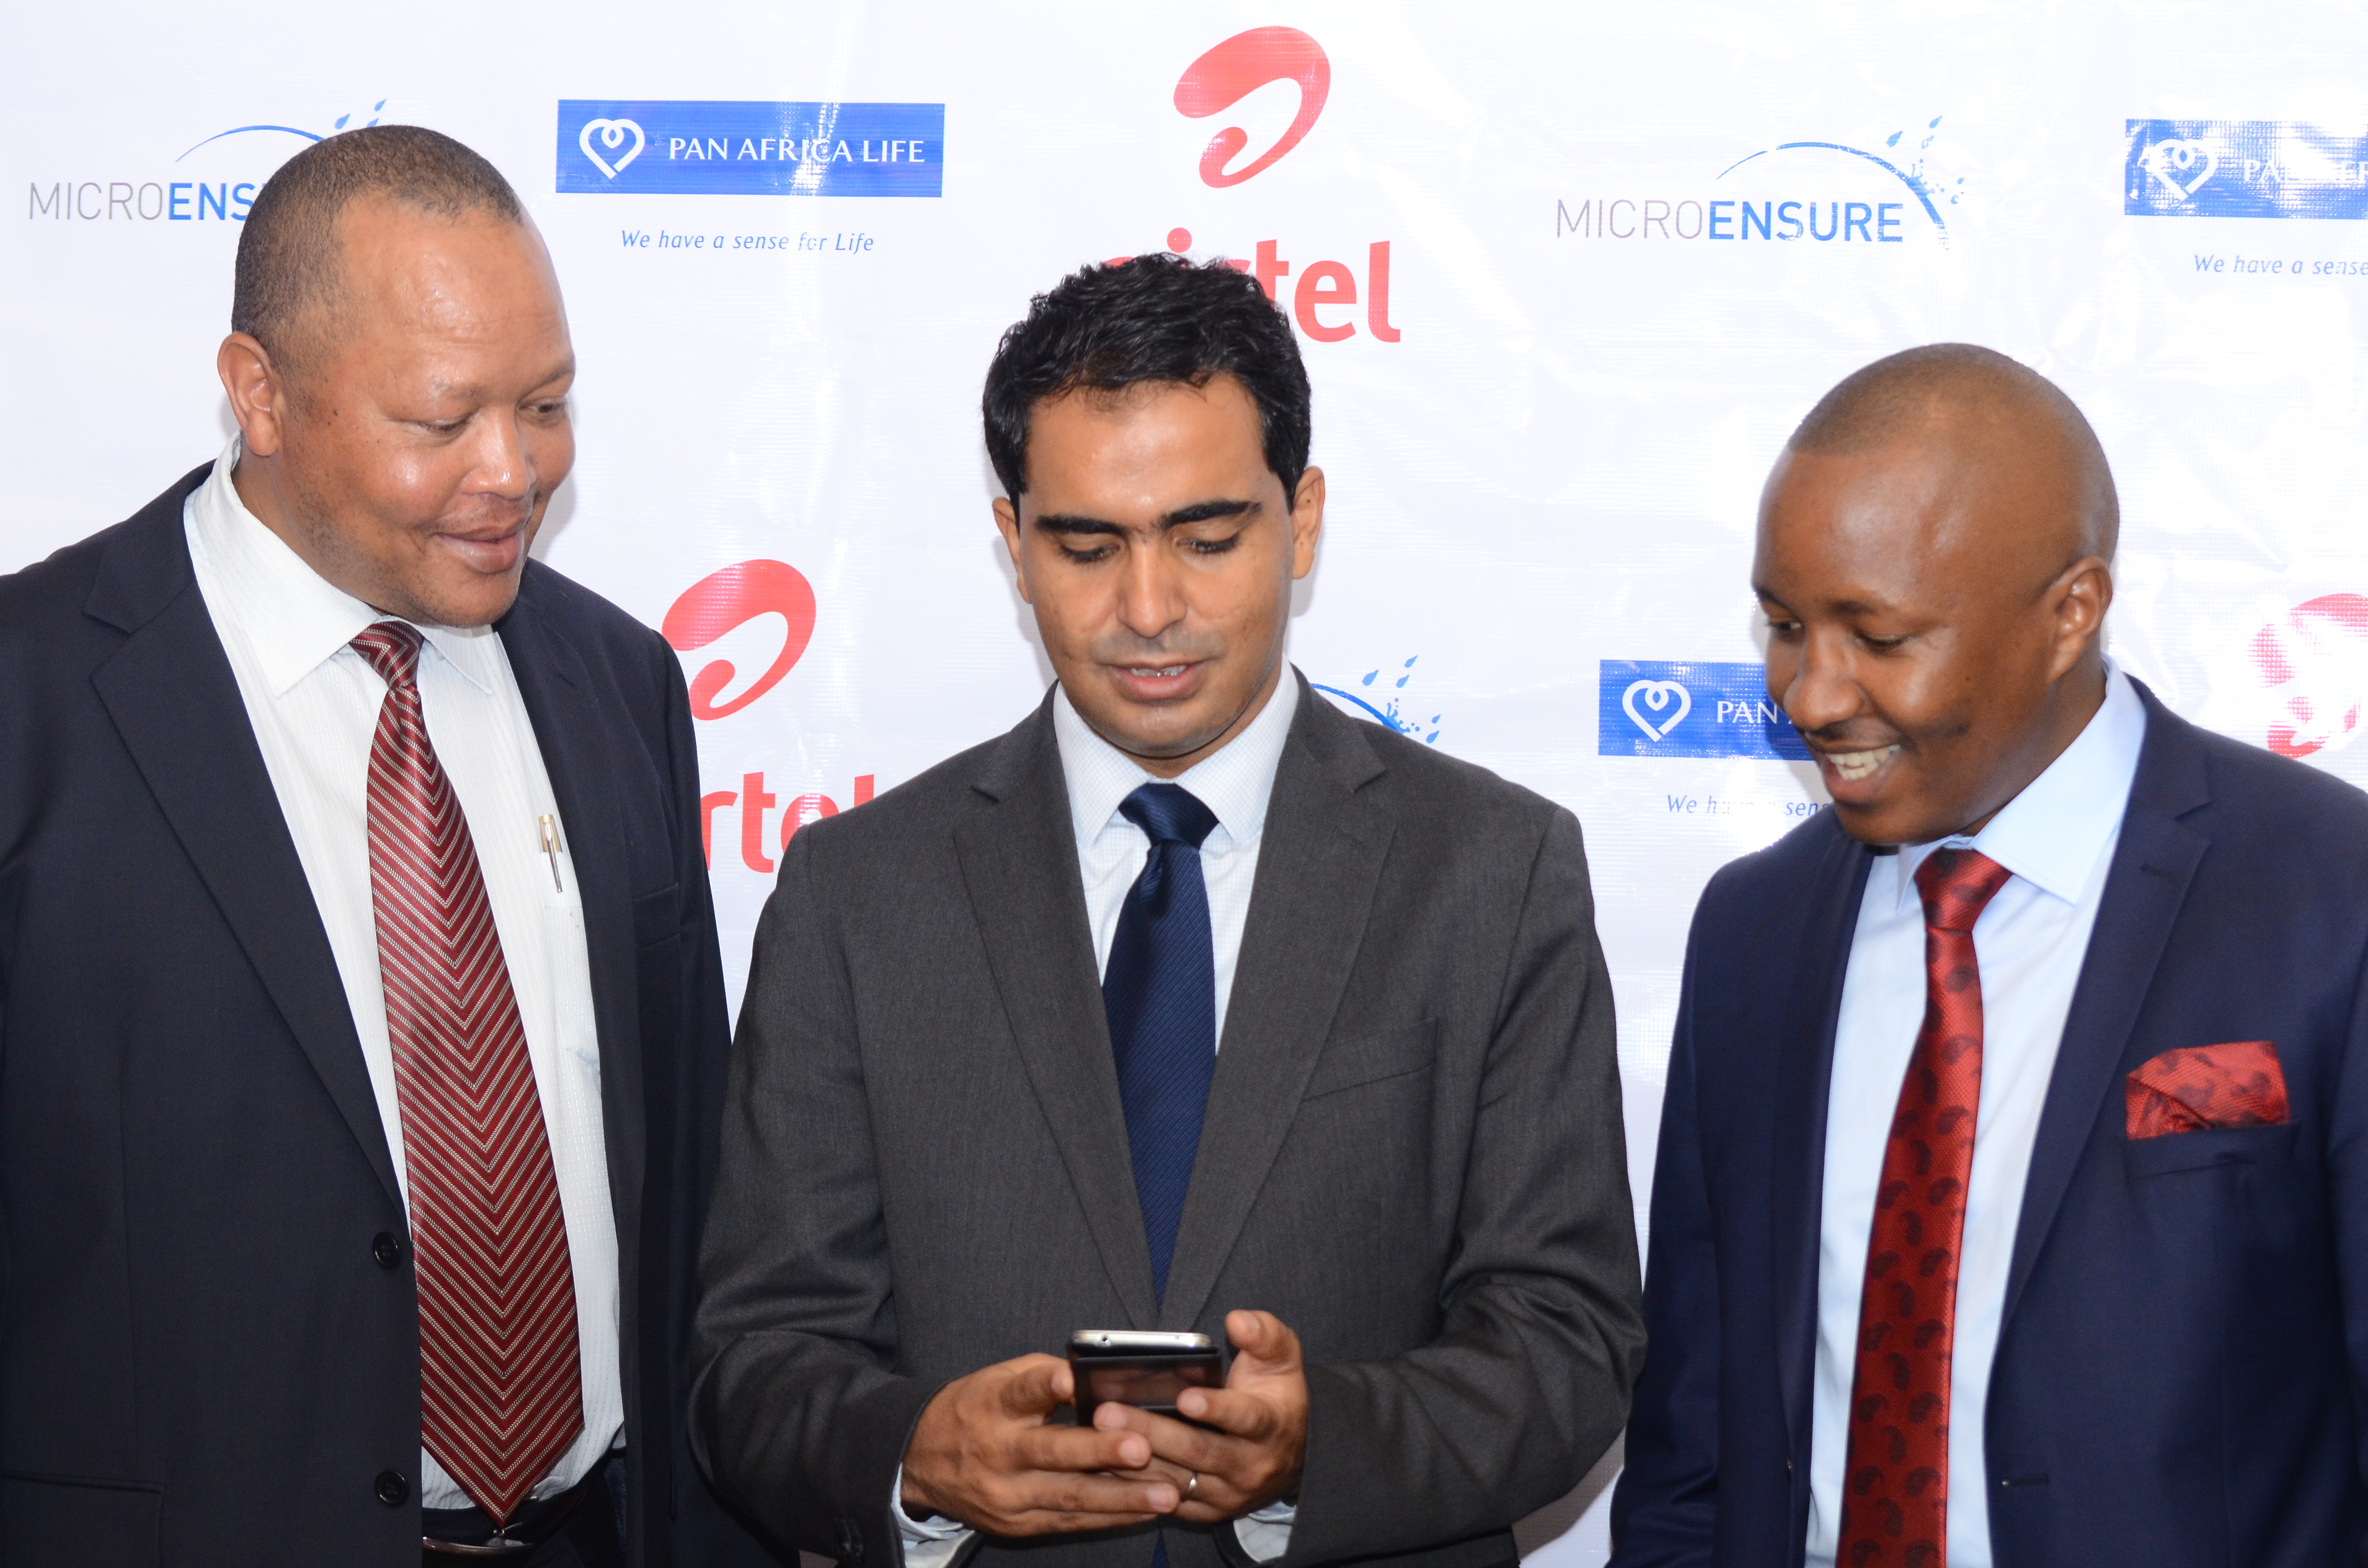 Pan Africa Life Insurance CEO Stephen Kamanda, Airtel Kenya CEO Adil El Youssefi & MicroEnsure Regional Director Kiereini Kirika during the official launch of Airtel Insurance